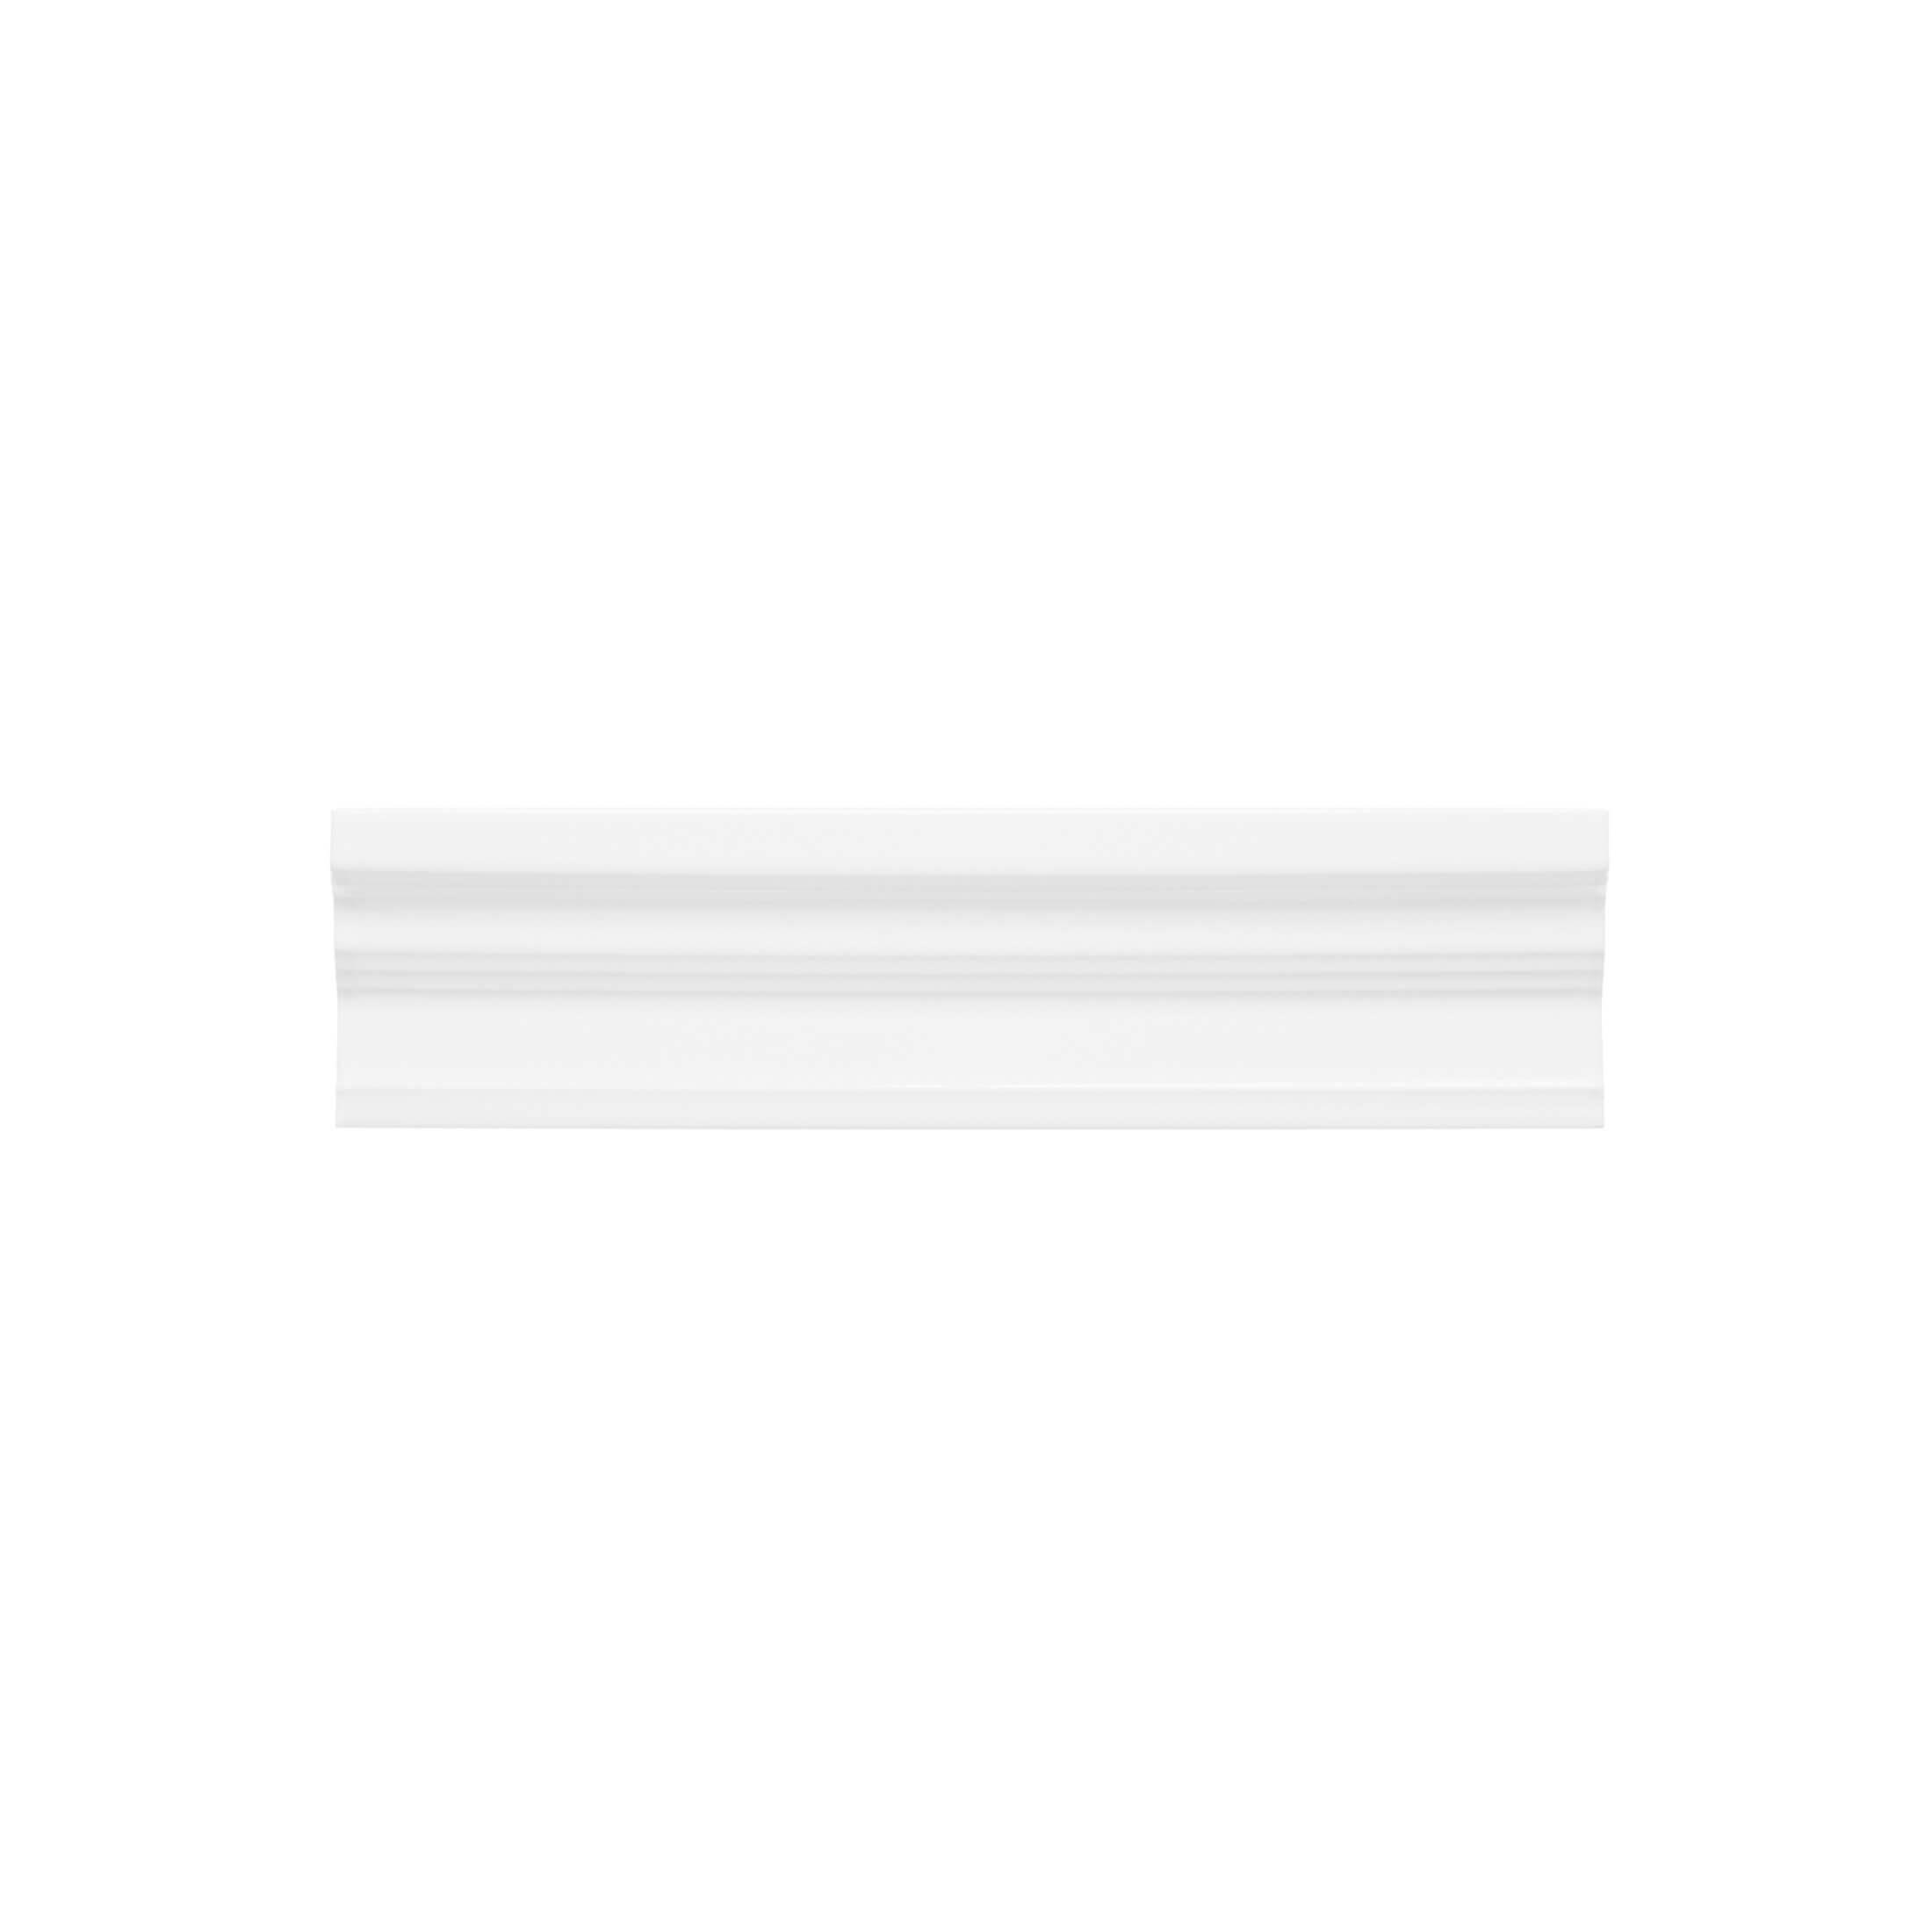 ADNE5464 - CORNISA CLASICA - 5 cm X 20 cm